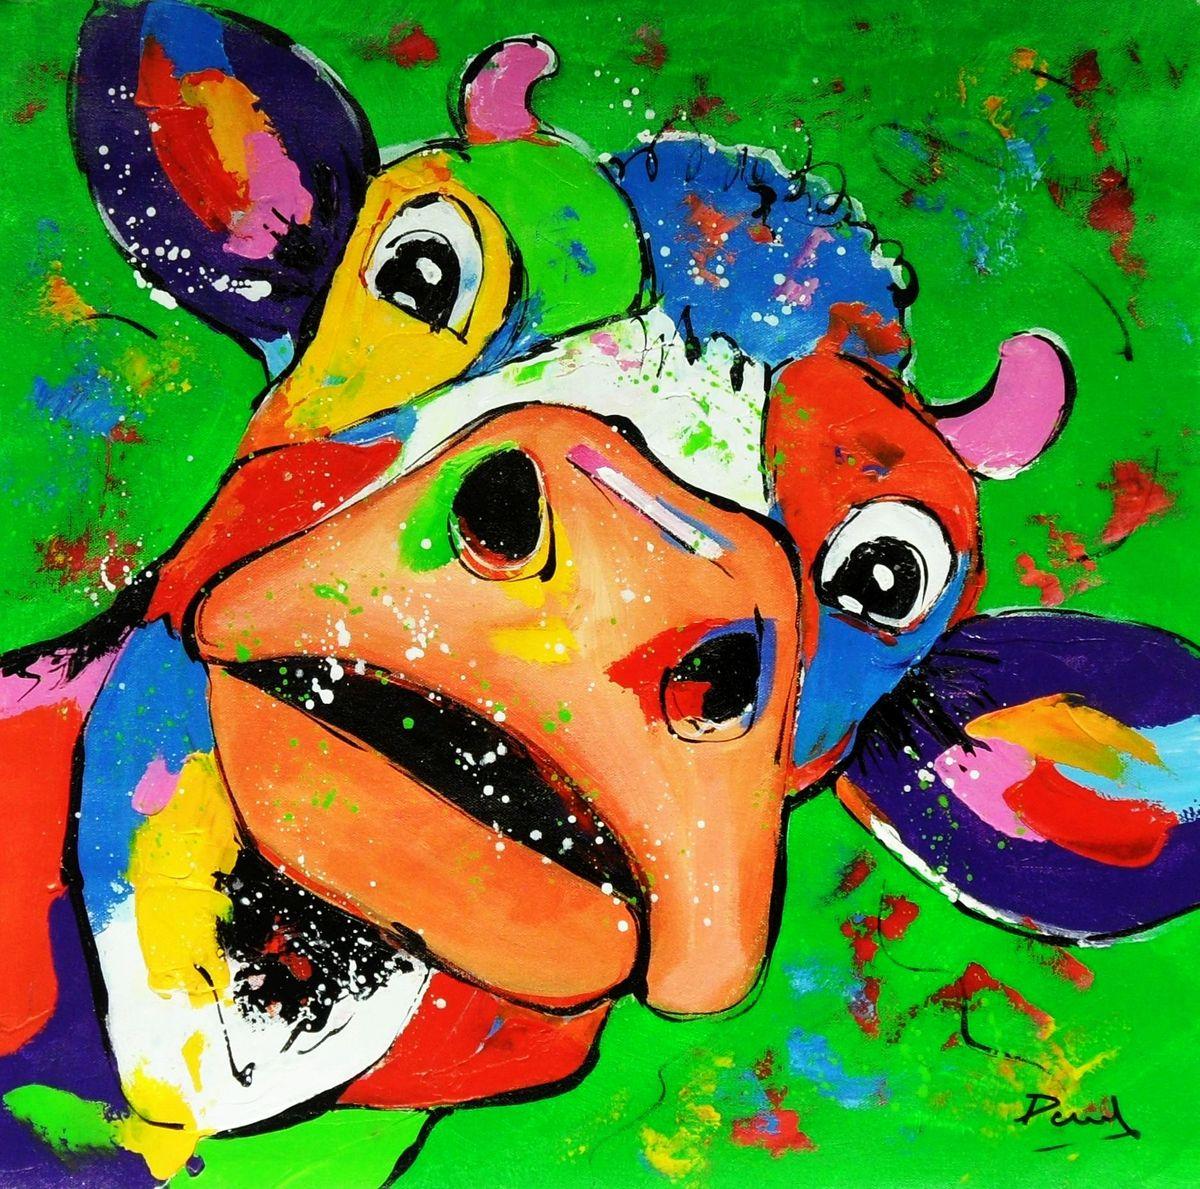 Modern Art - Kuh Elsa e96478 60x60cm lustiges Ölbild